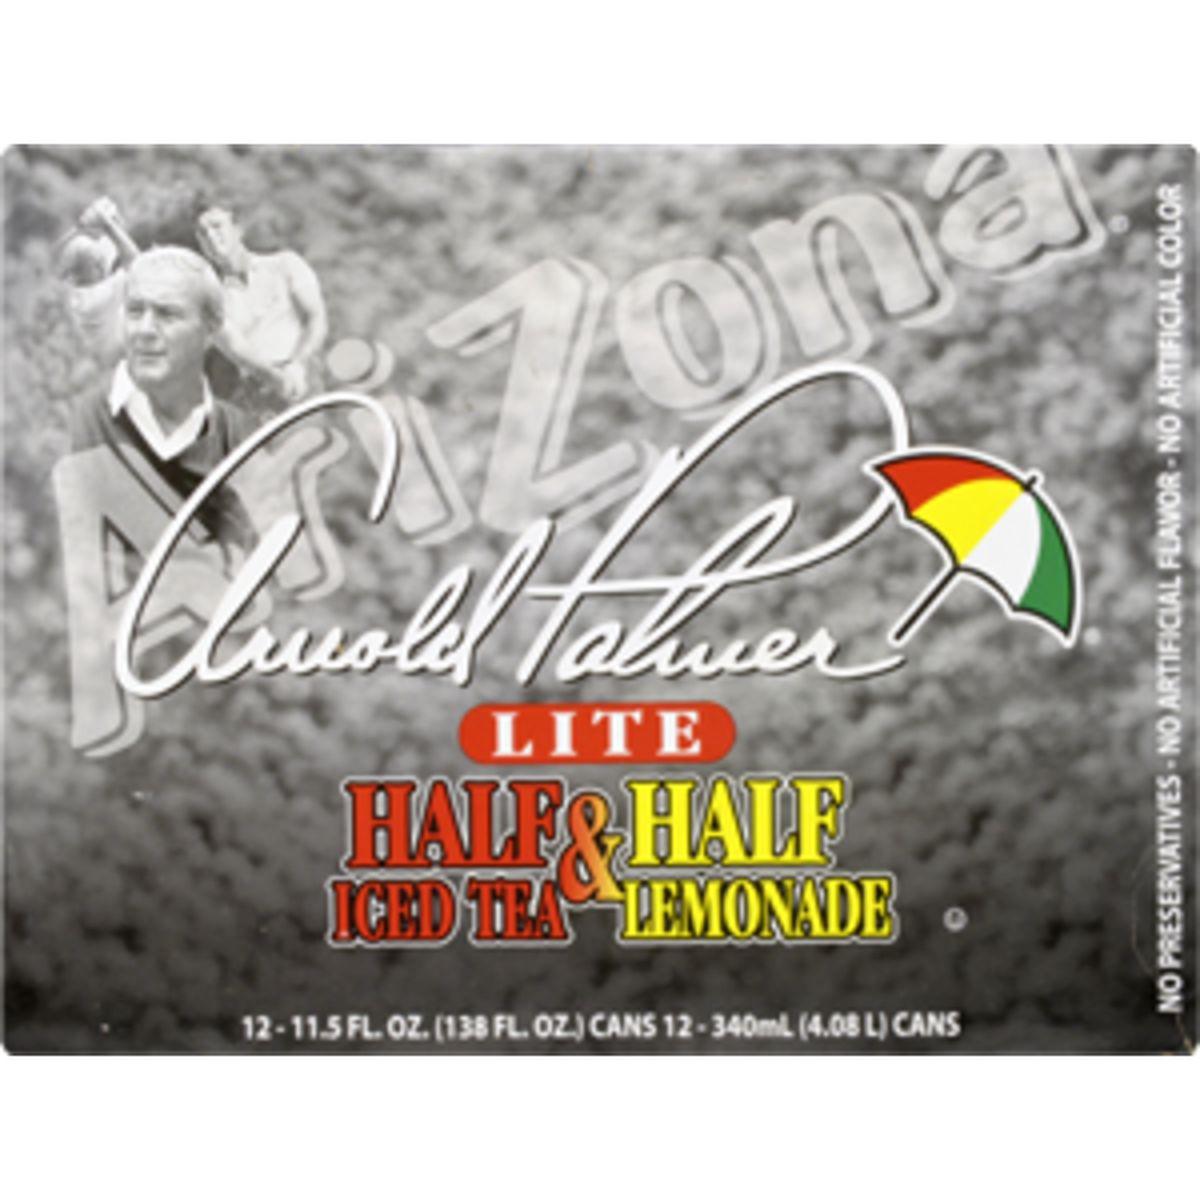 Arnold Palmer Half & Half Iced Tea Lemonade